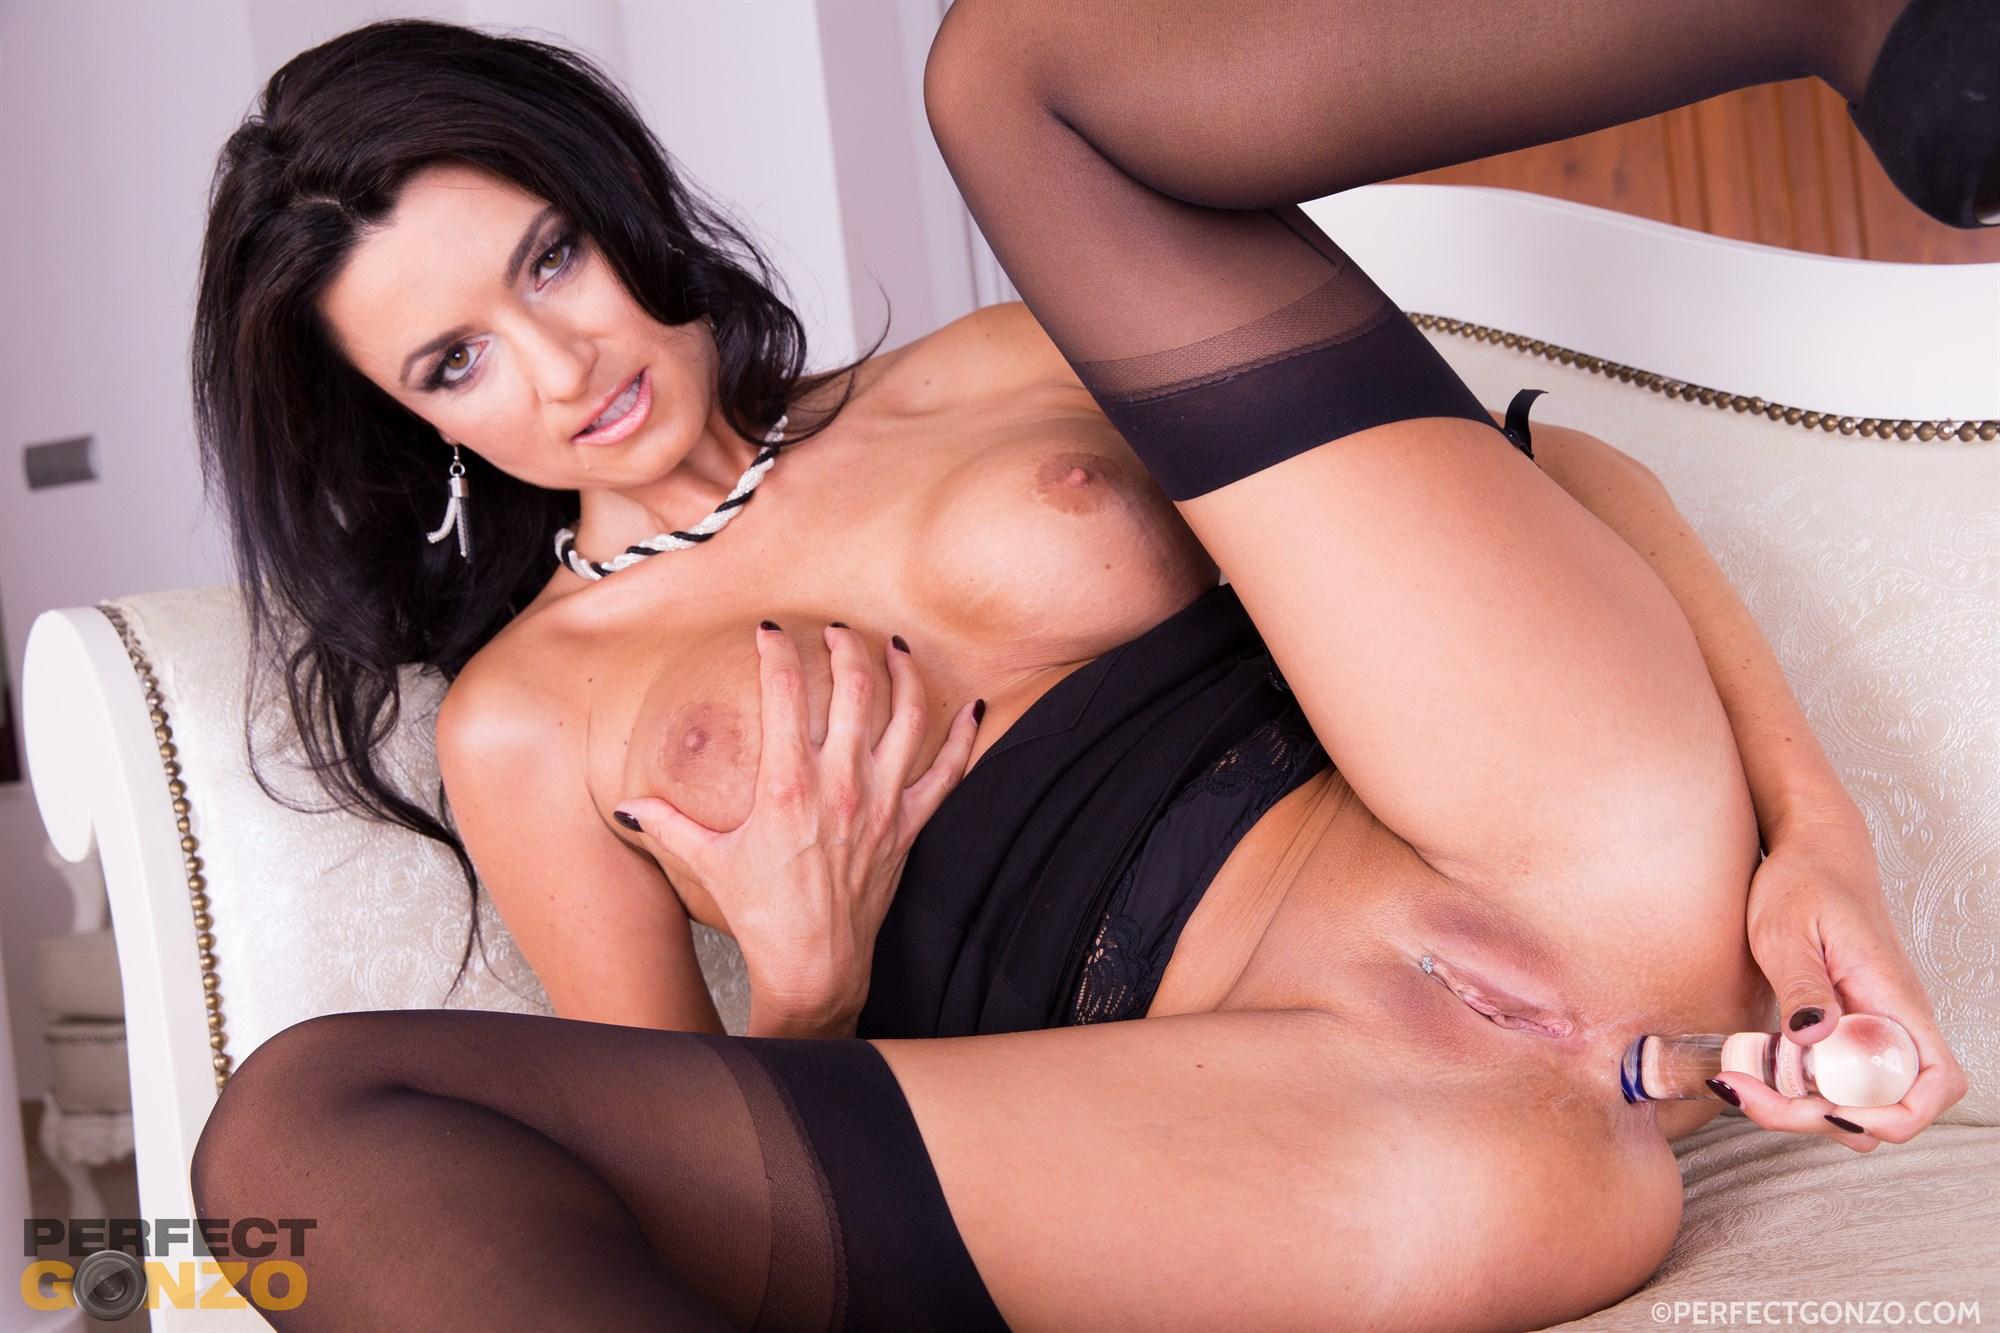 Ania Porn horny milf ania kinski aches for a huge cock porn pic - eporner